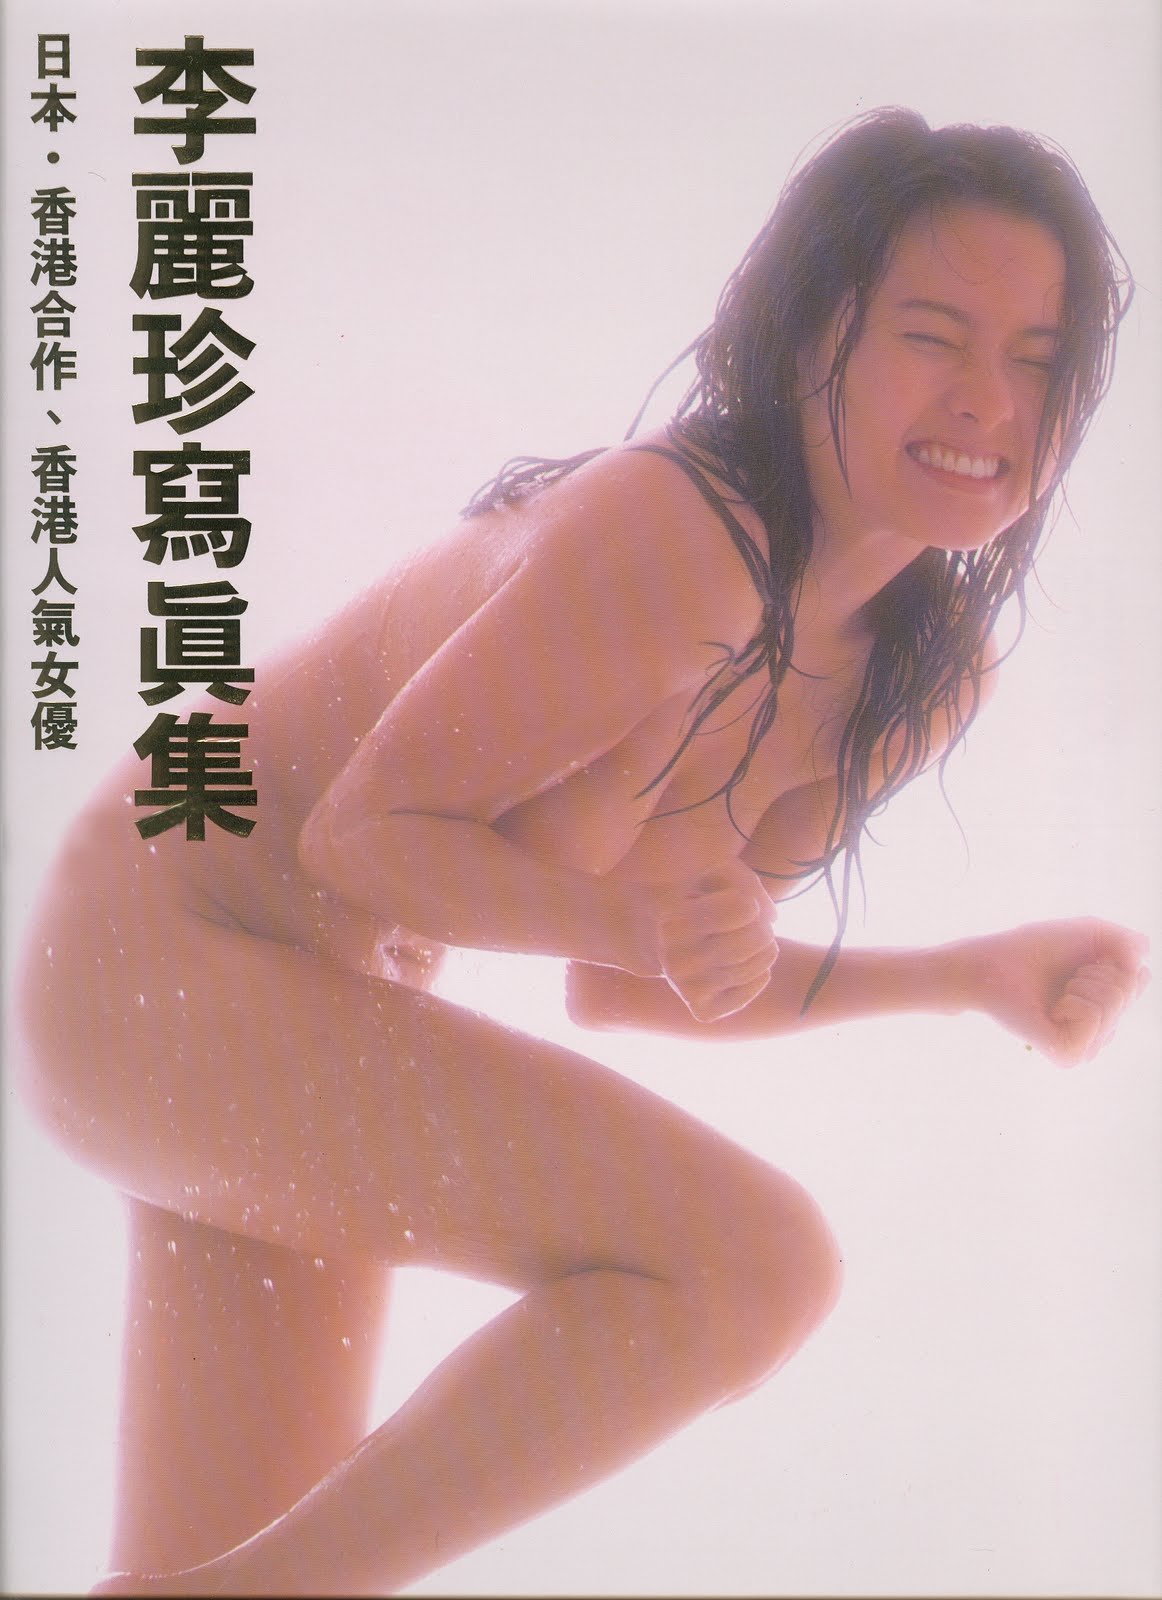 Free nudist photos pre